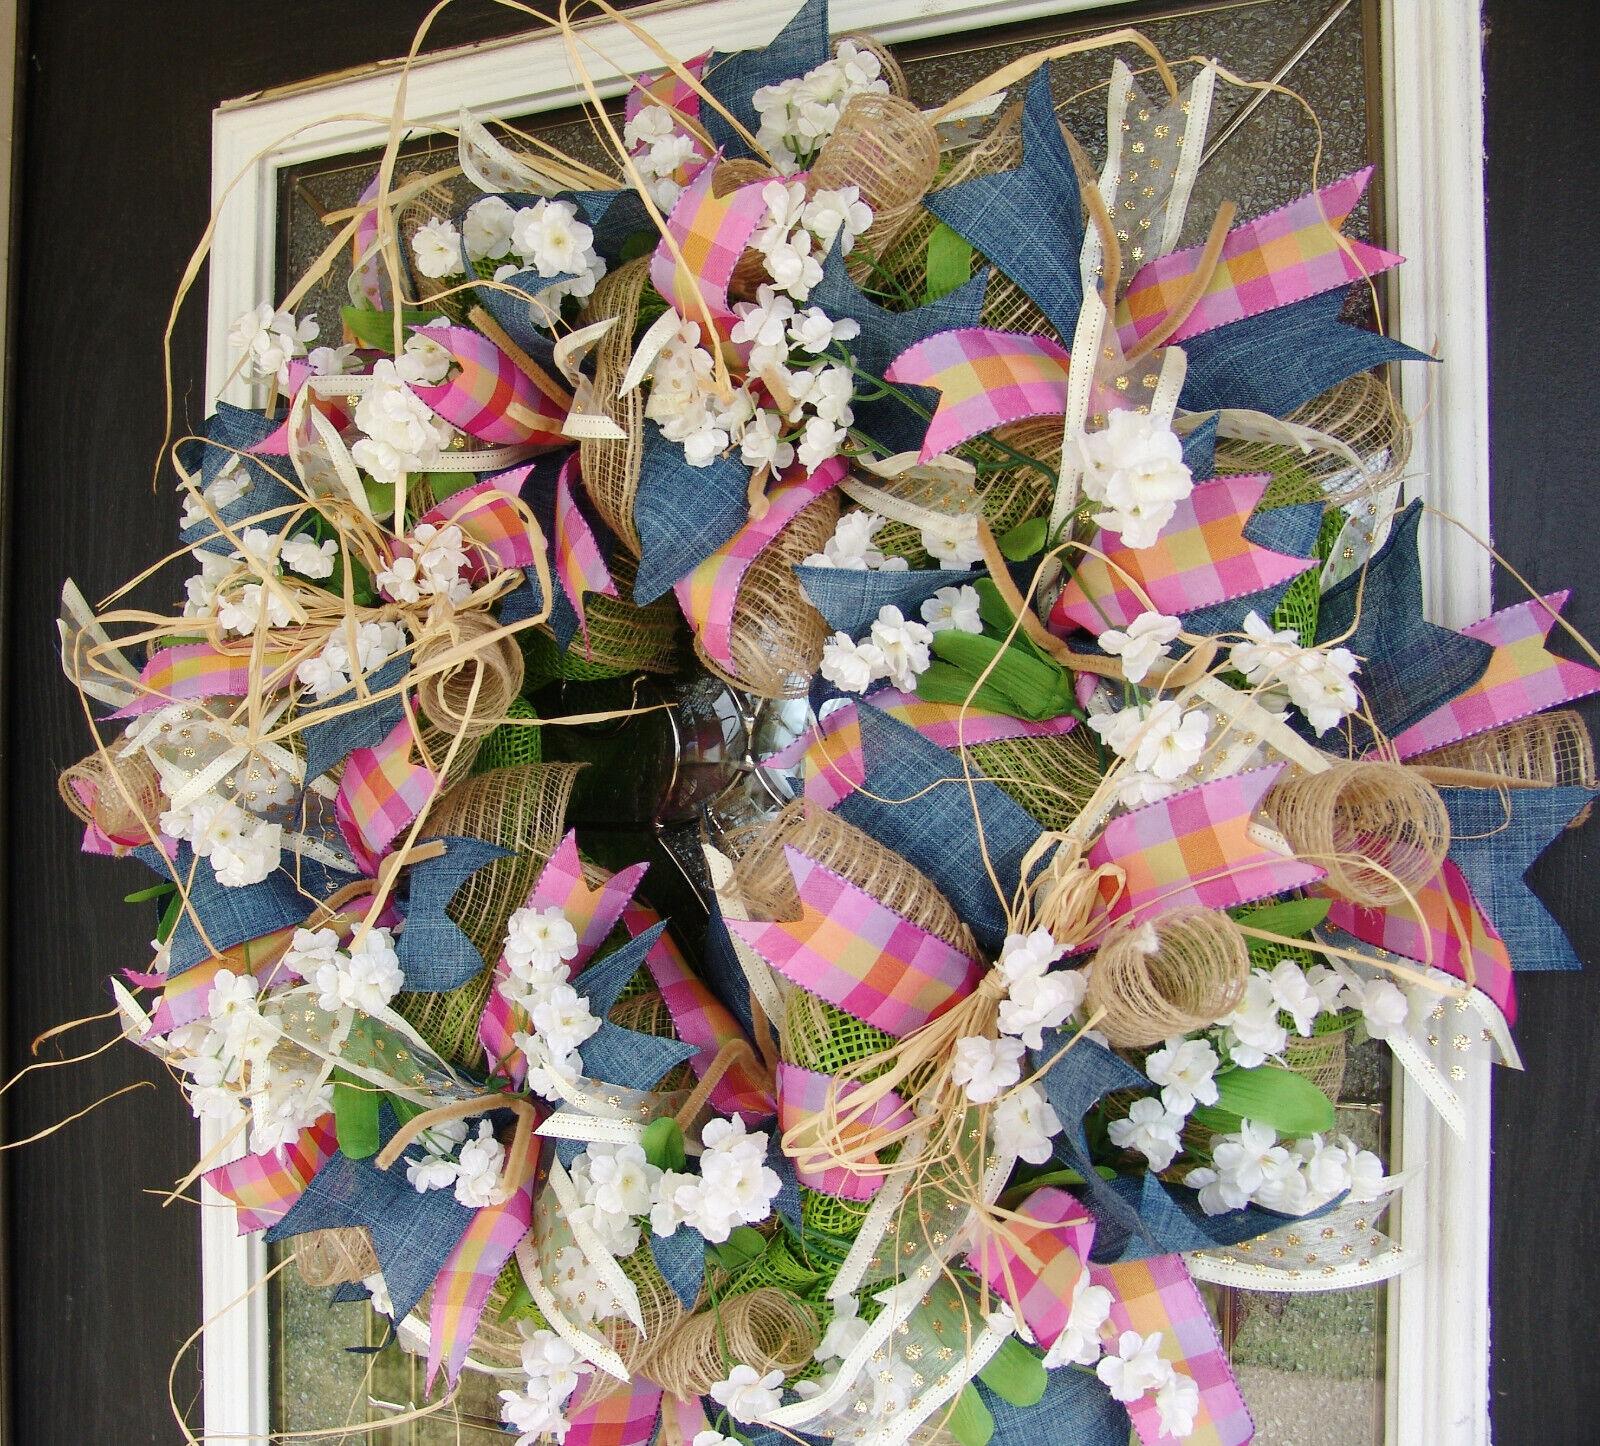 Country Farmhouse Spring Deco Mesh Front Door Wreath, Denim Floral Easter Decor